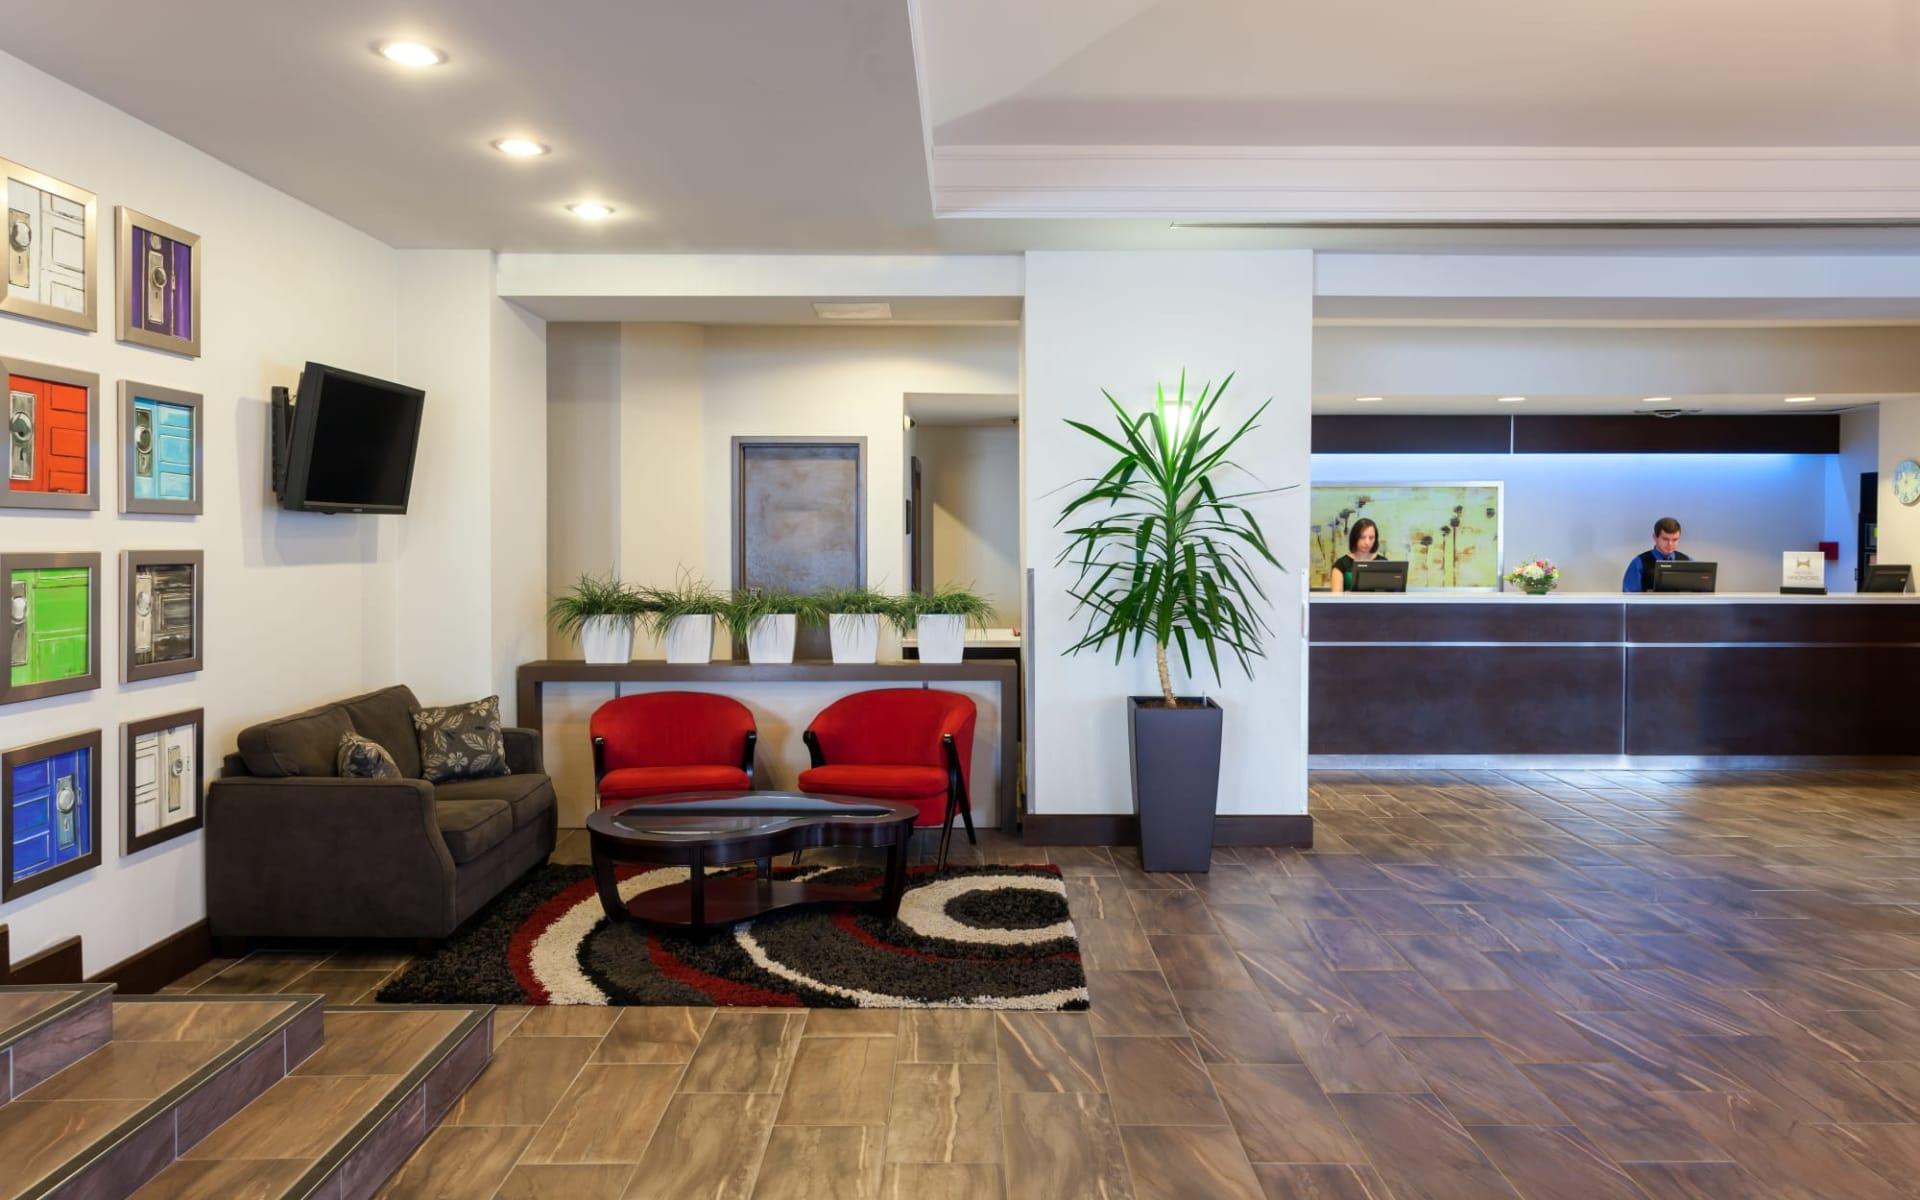 Hilton Saint John: facilities_Hilton Saint John_Lobby